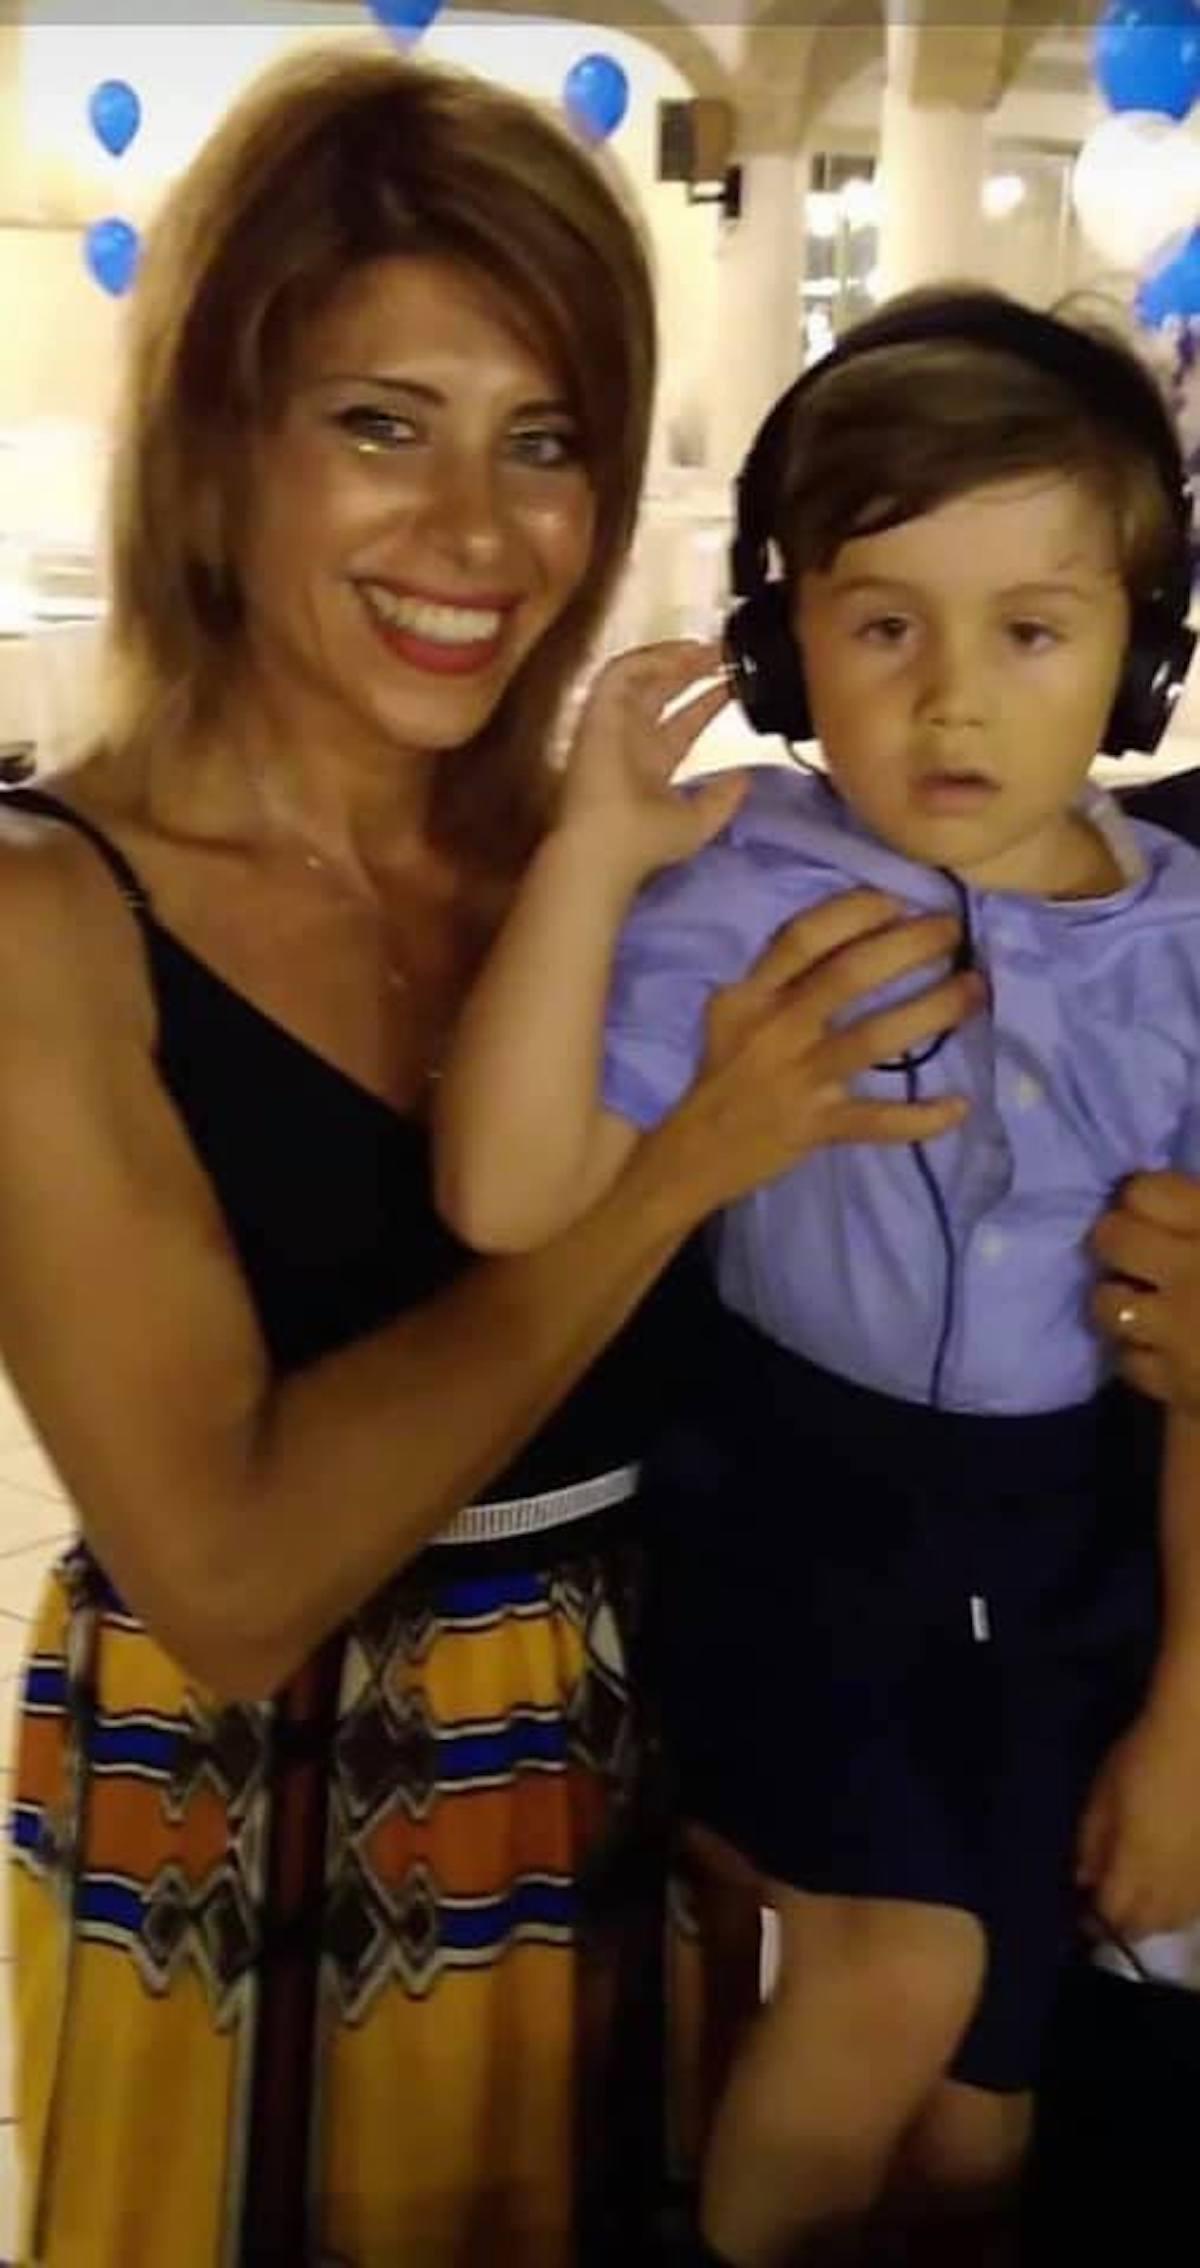 Gioele e Viviana Parisi